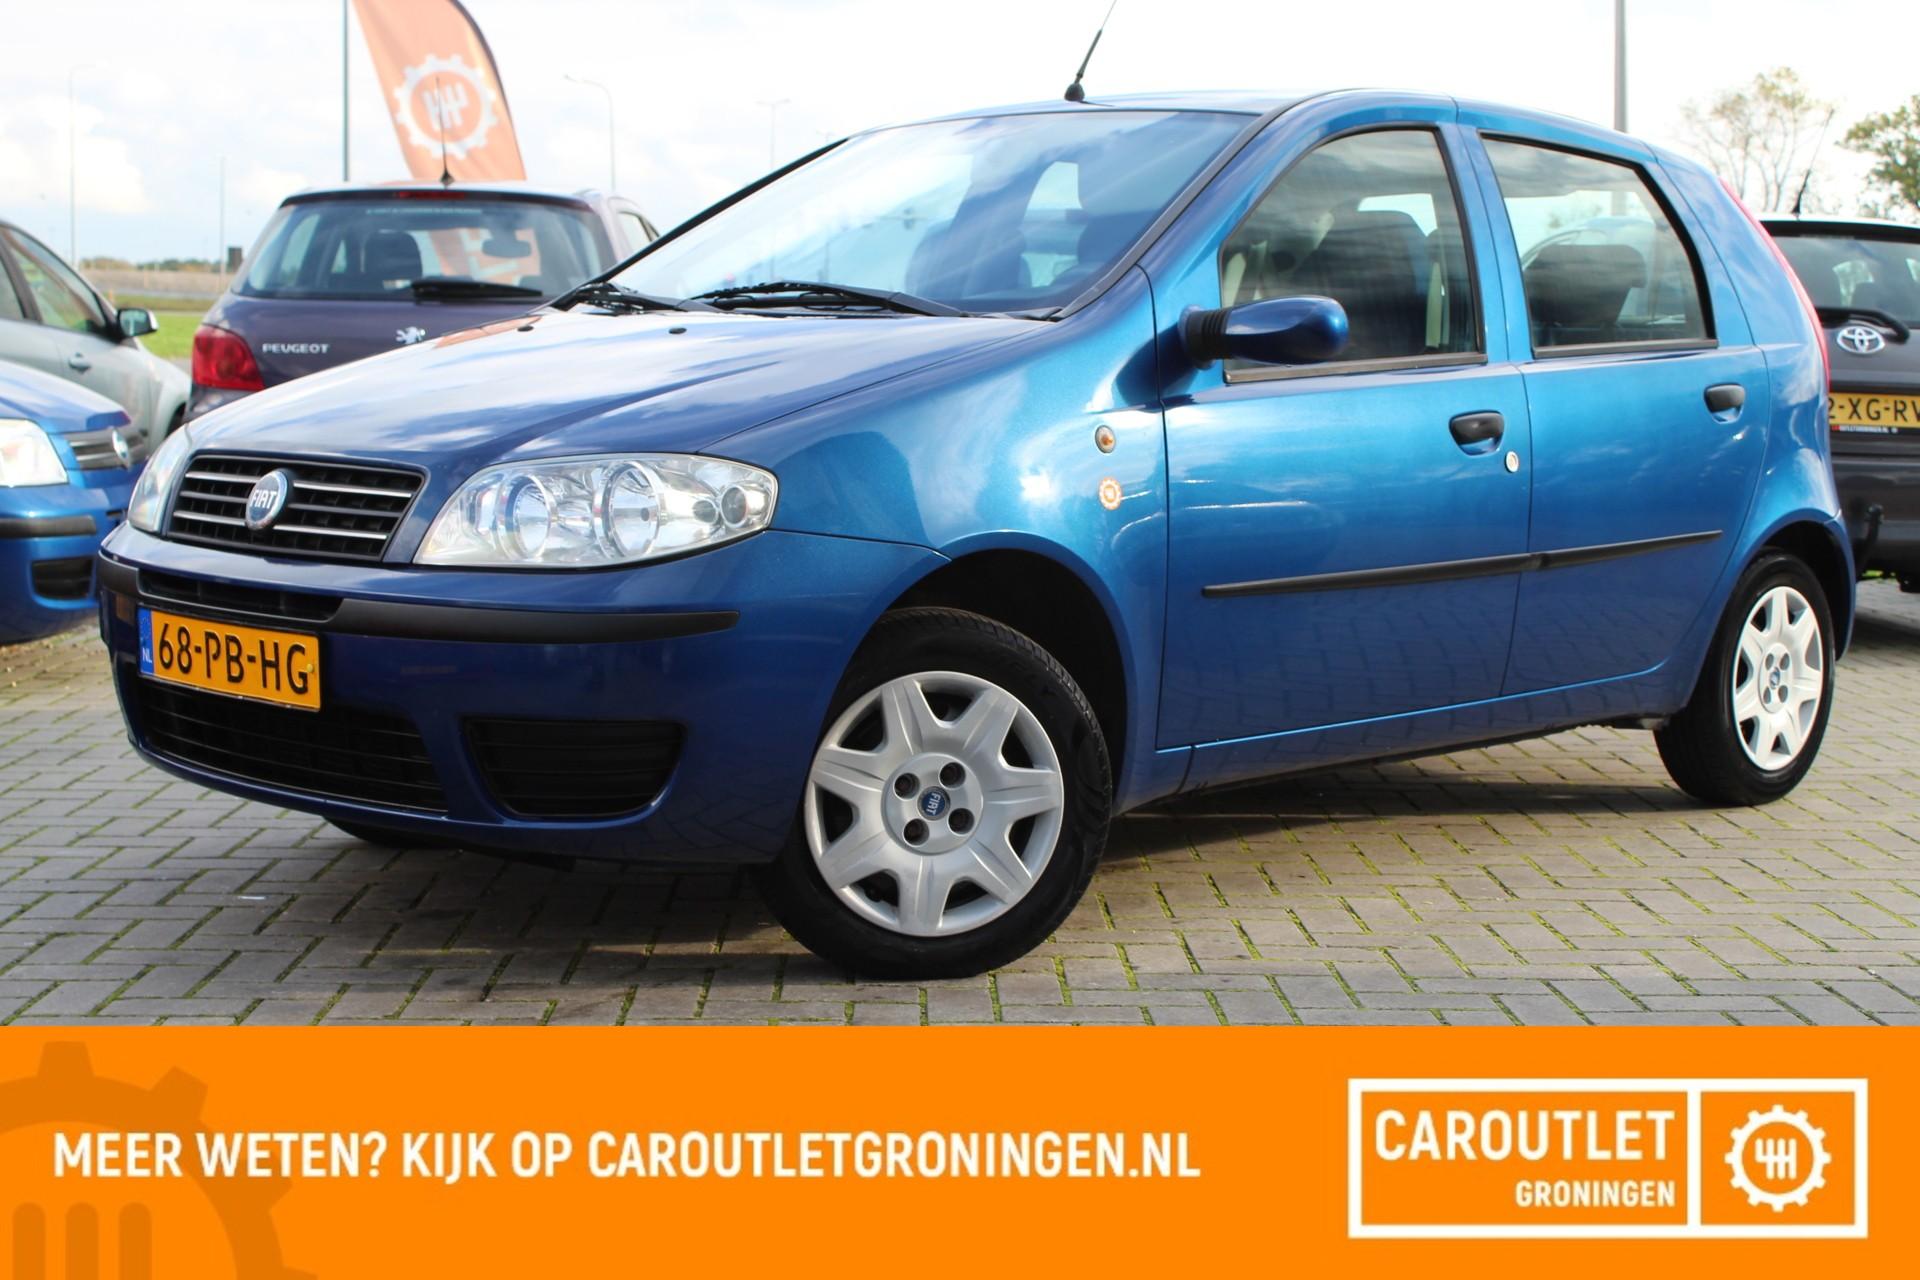 Caroutlet Groningen - Fiat Punto 1.2 Active   2004   AIRCO   5 DEURS  